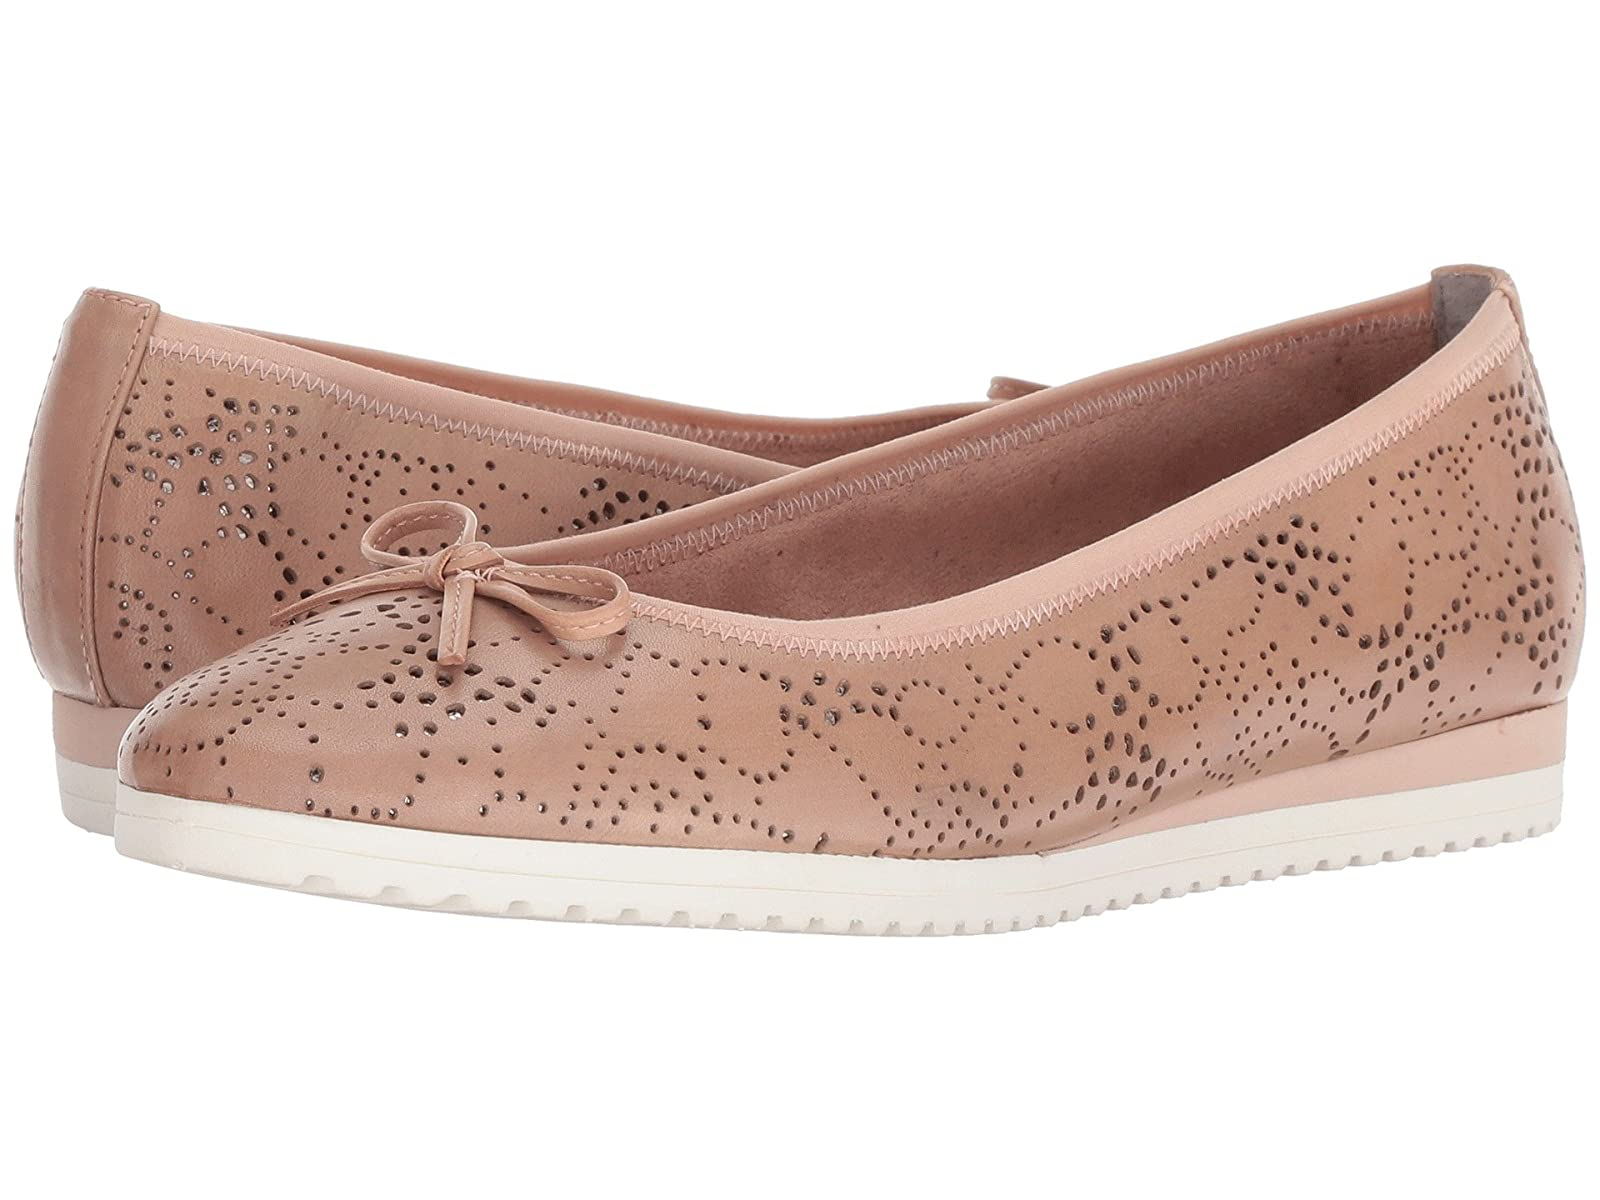 Tamaris Alena 1-1-22124-20Atmospheric grades have affordable shoes